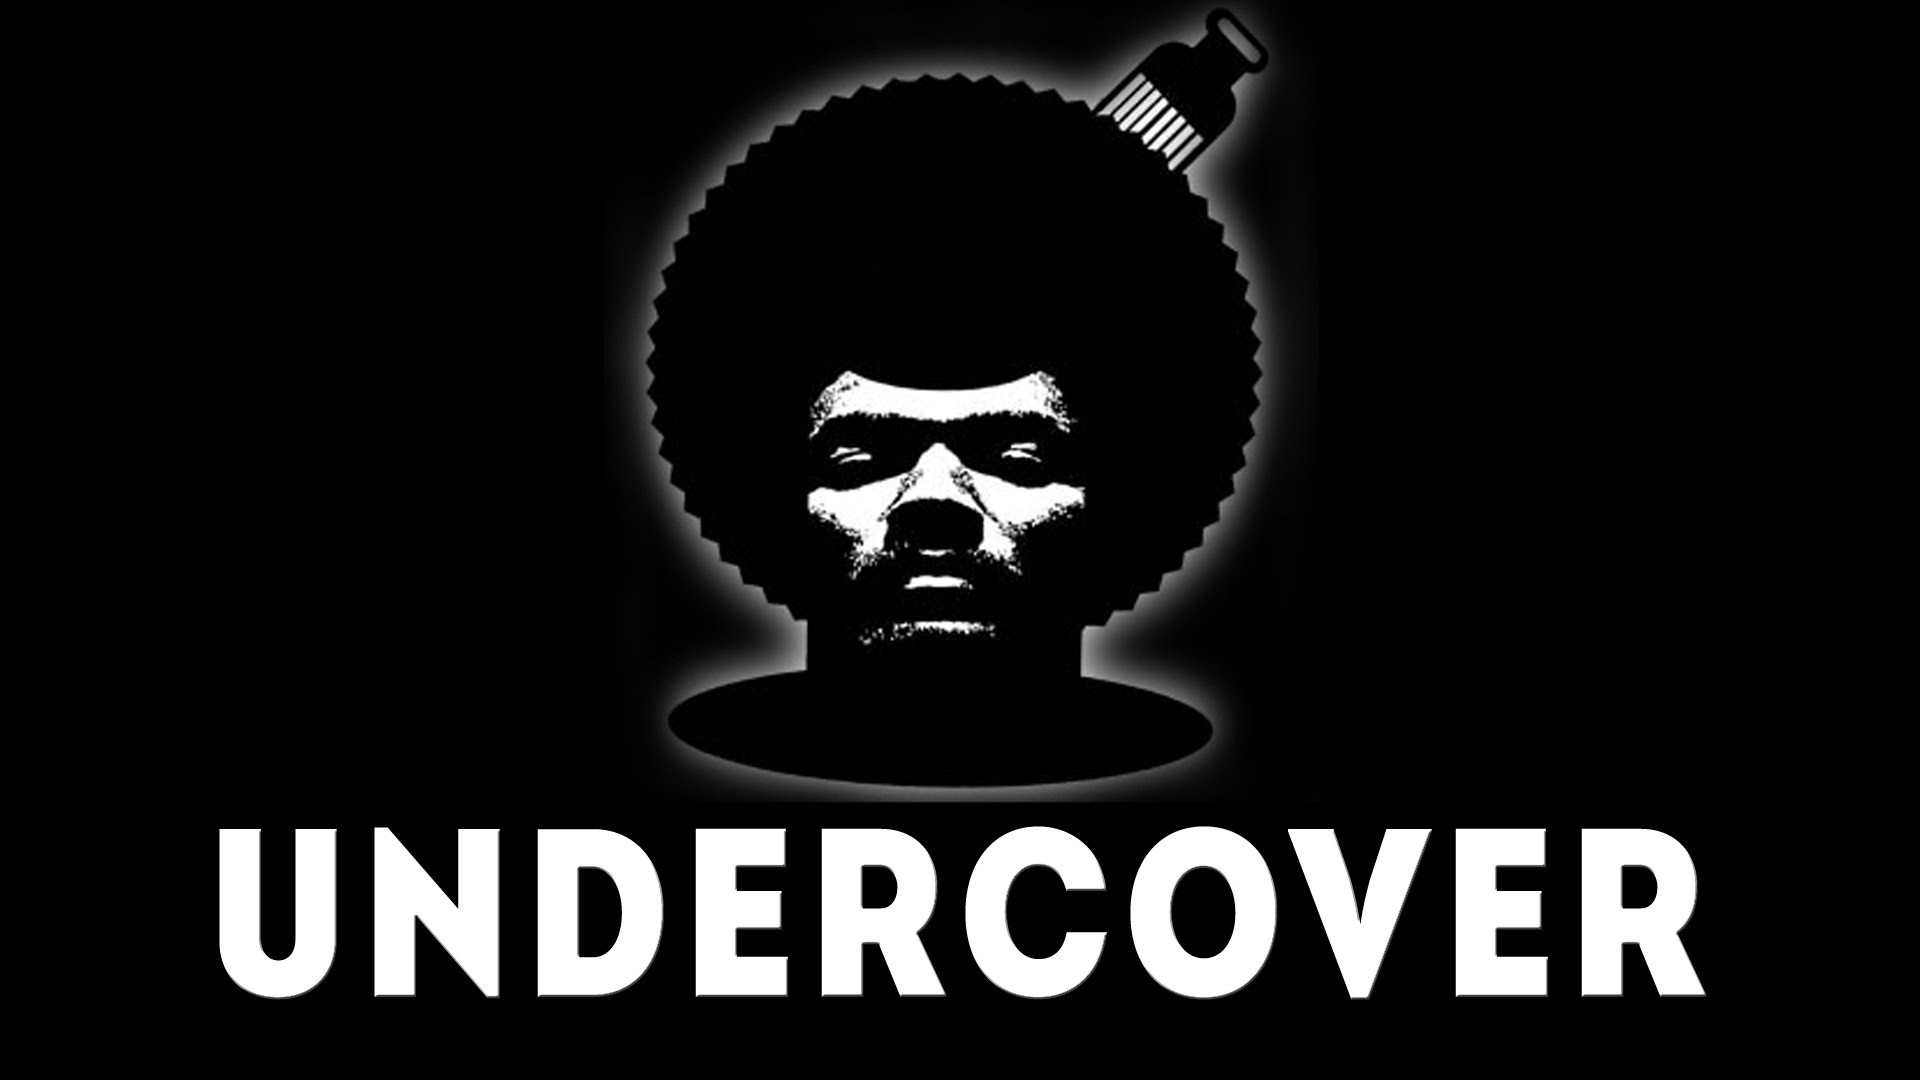 UNDERCOVER: Pete Rock Sample ReFlip [Old School Hip Hop Style Beat] Raw  Instrumental Rap Type – YouTube